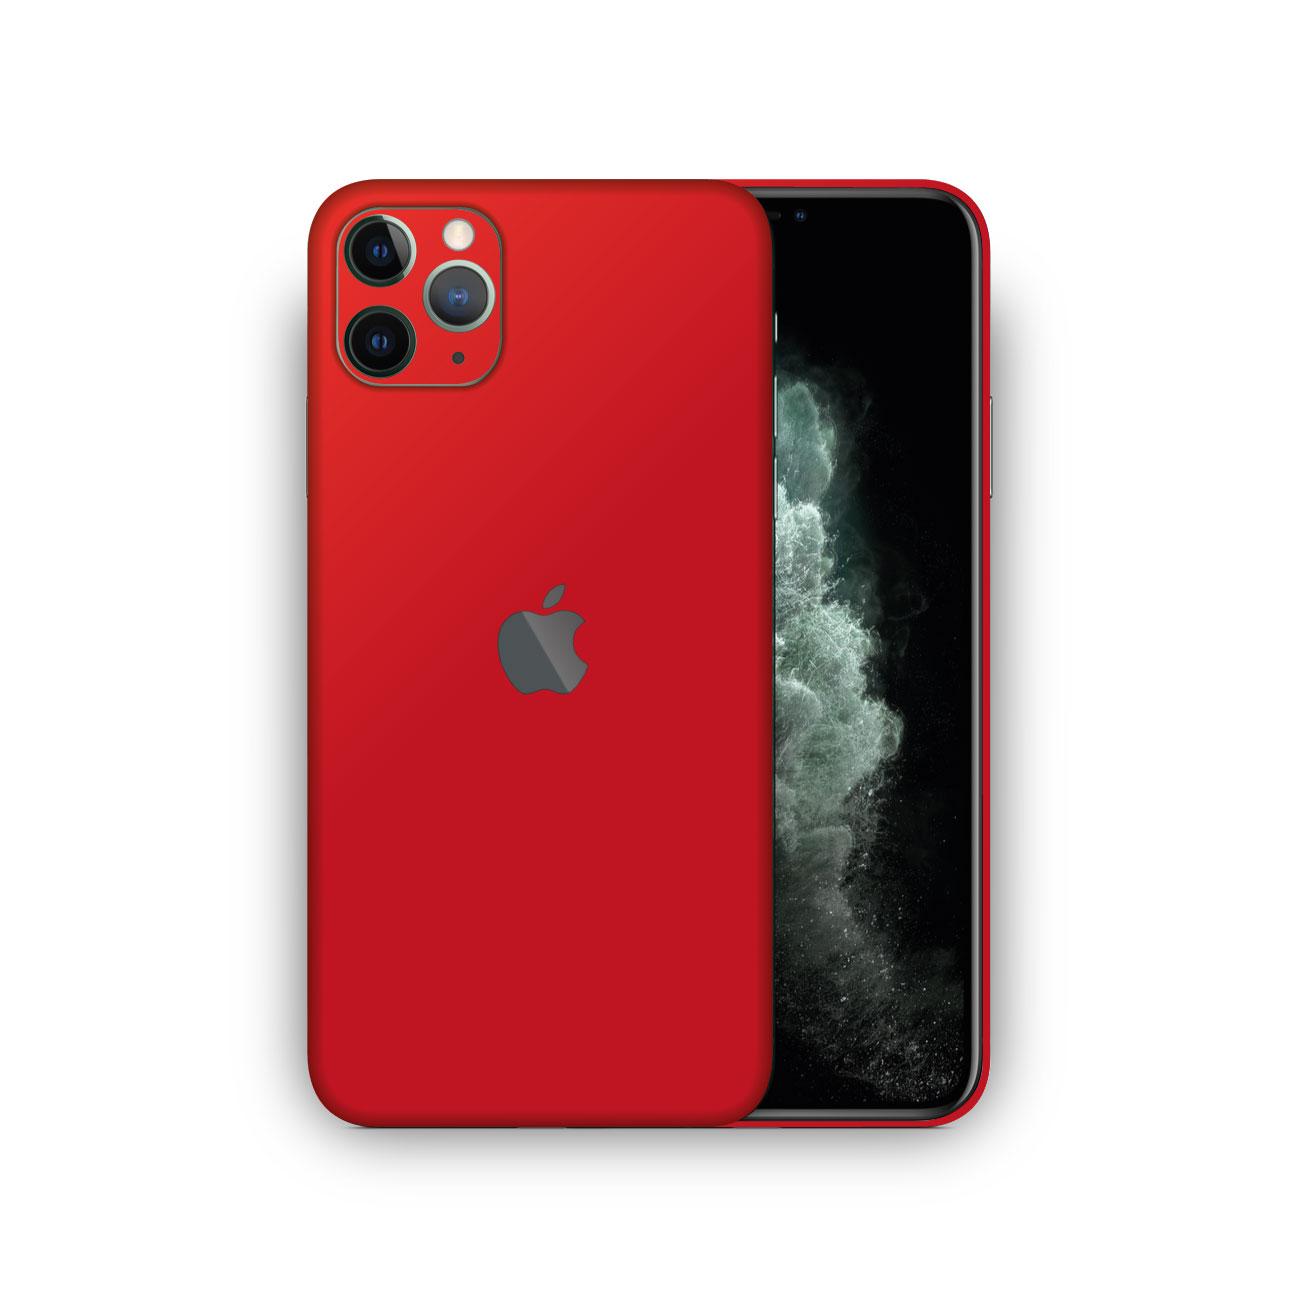 Apple iPhone 11 Pro Max MATTE RED Skin Vinyl Wrap